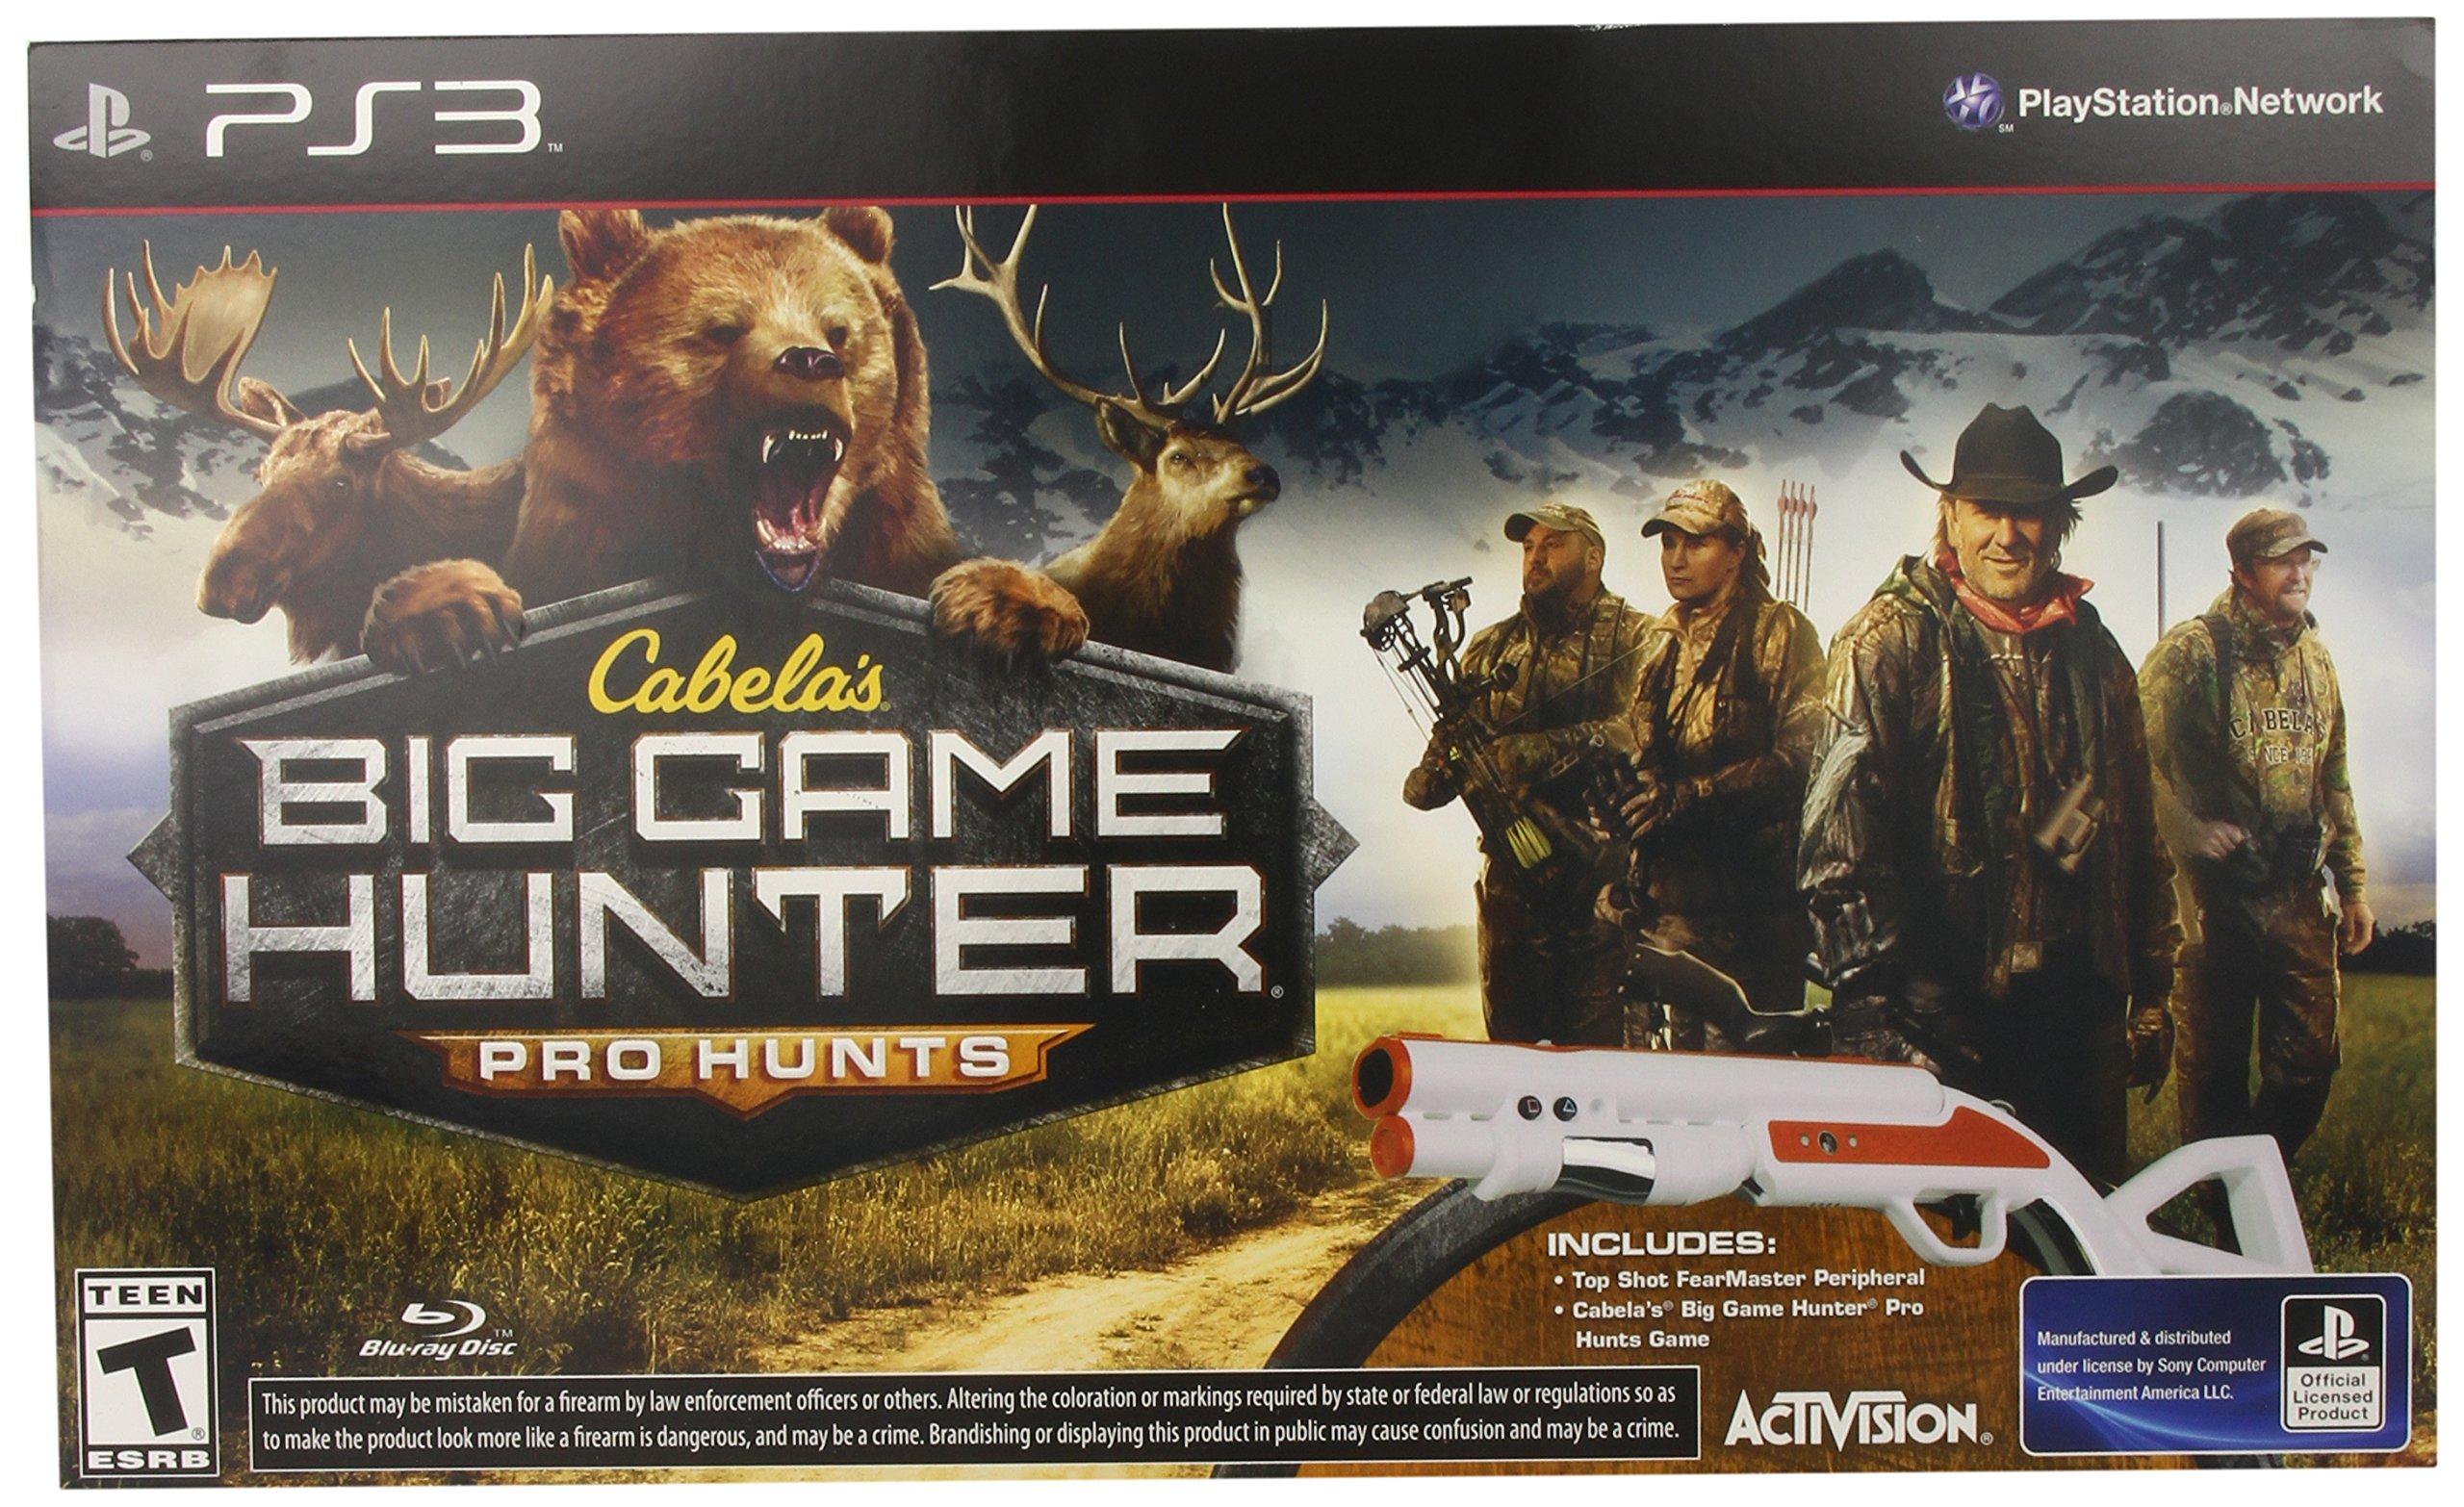 Cabela's: Big Game Hunter Pro Hunts with Gun - PlayStation 3 by Activision (Image #1)